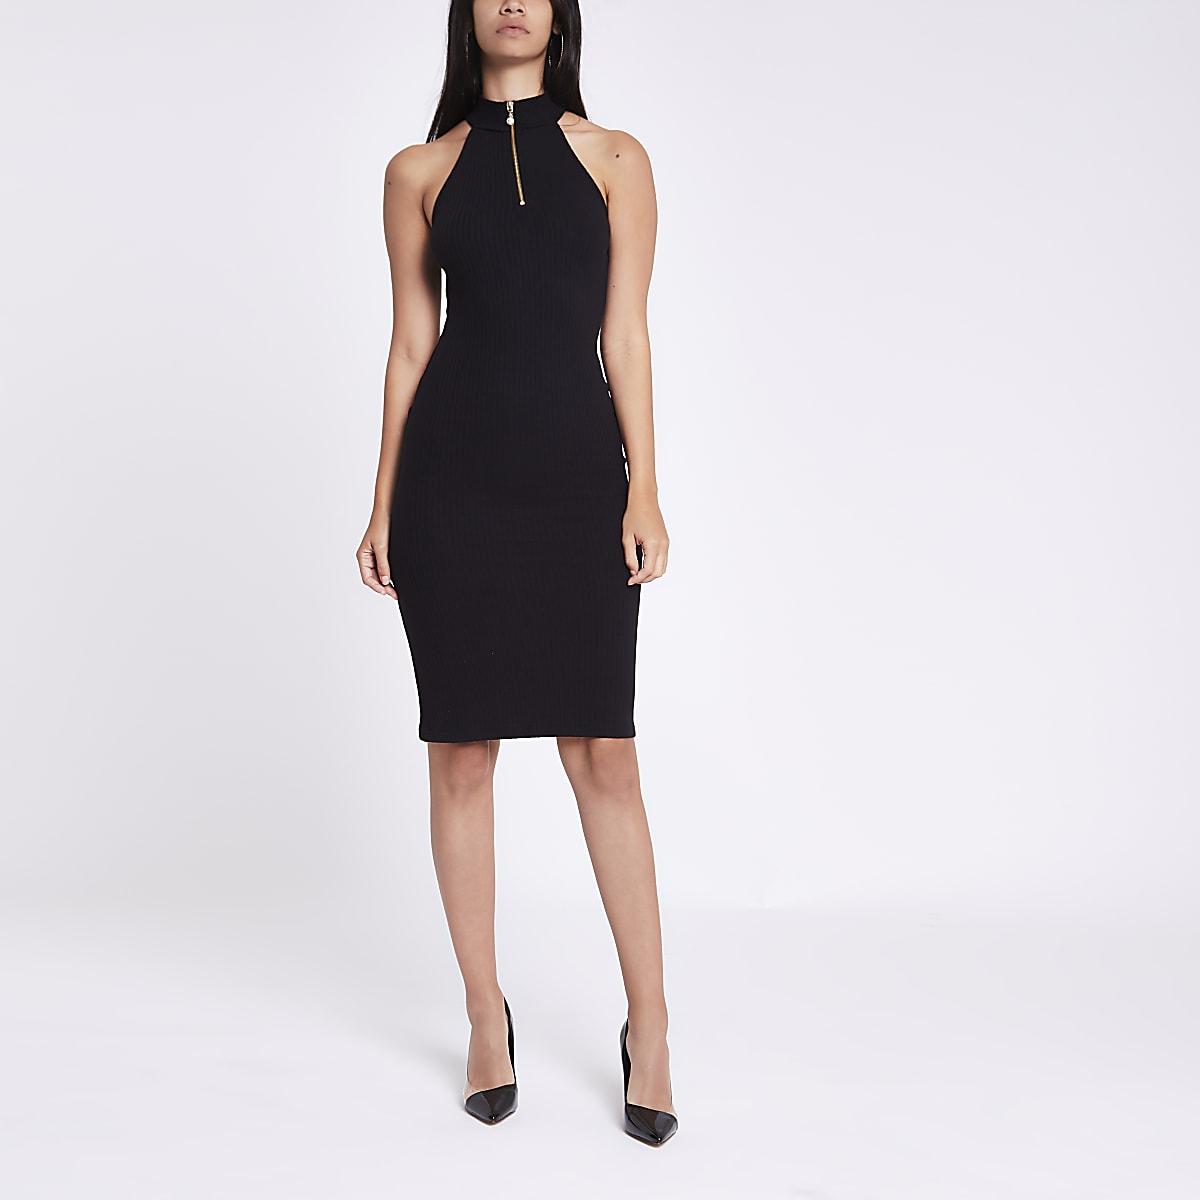 Black halter neck zip mini bodycon dress